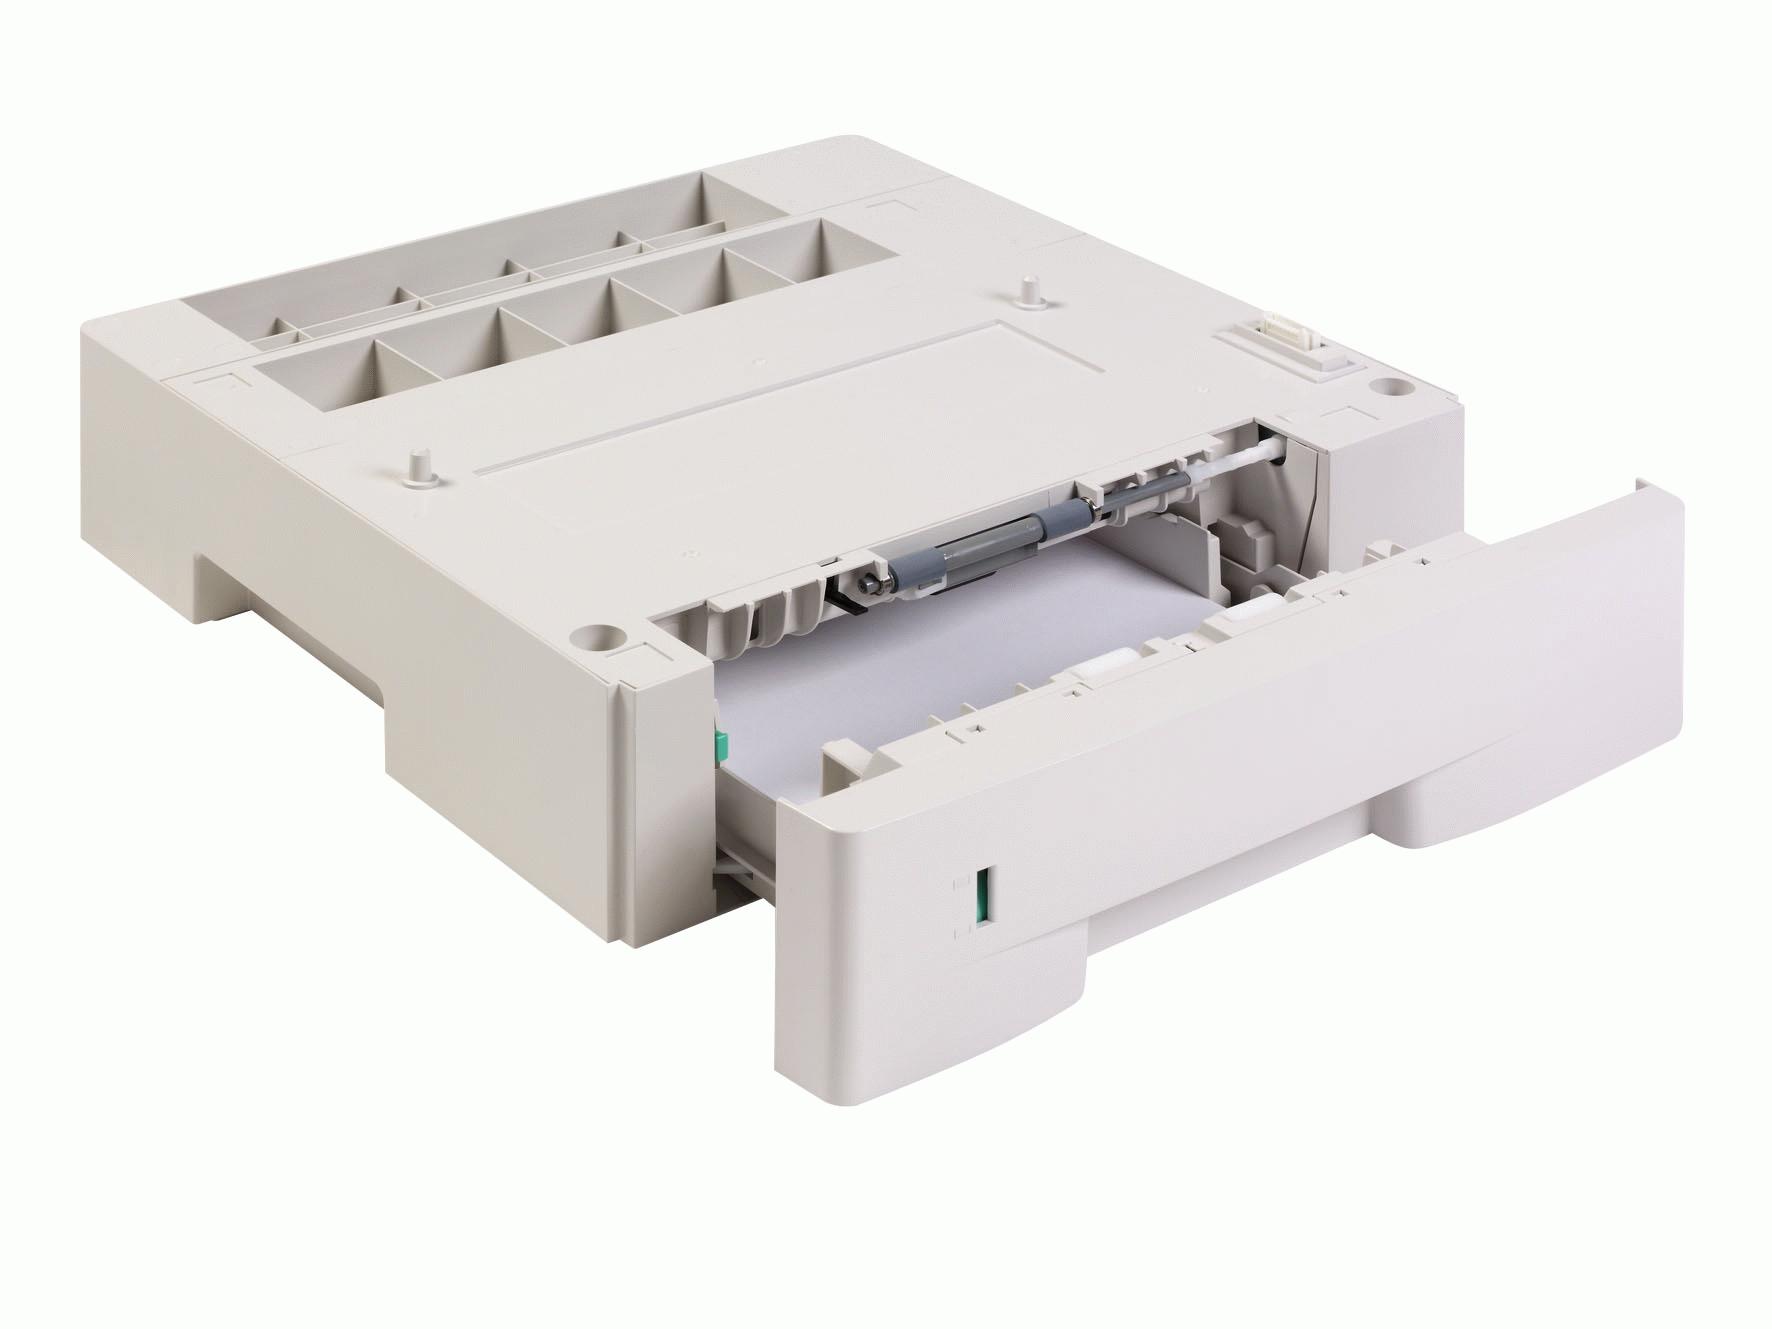 Kyocera PF-100 - Papierfach 250 Blatt